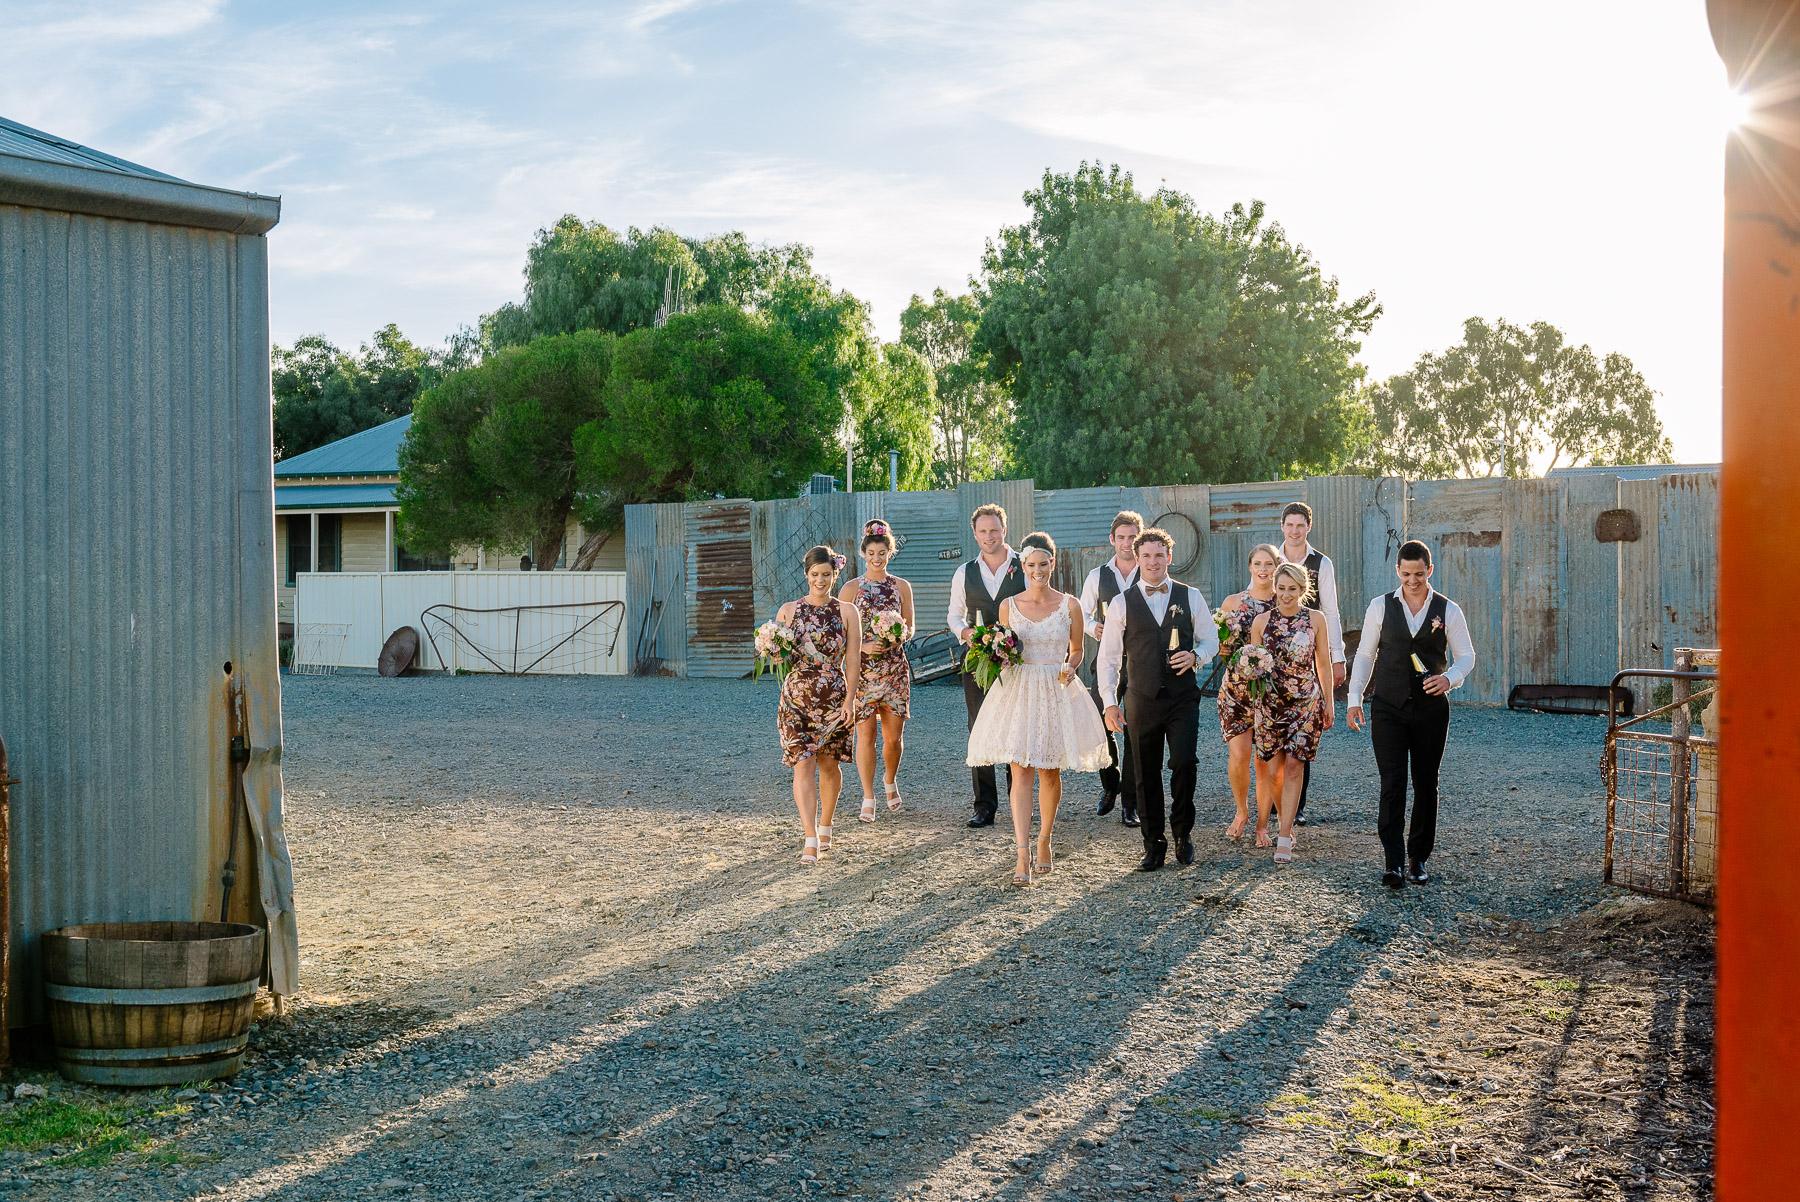 Melissa_and_Kristan_Echuca_Farm_Wedding_New_Years_Eve-92.jpg